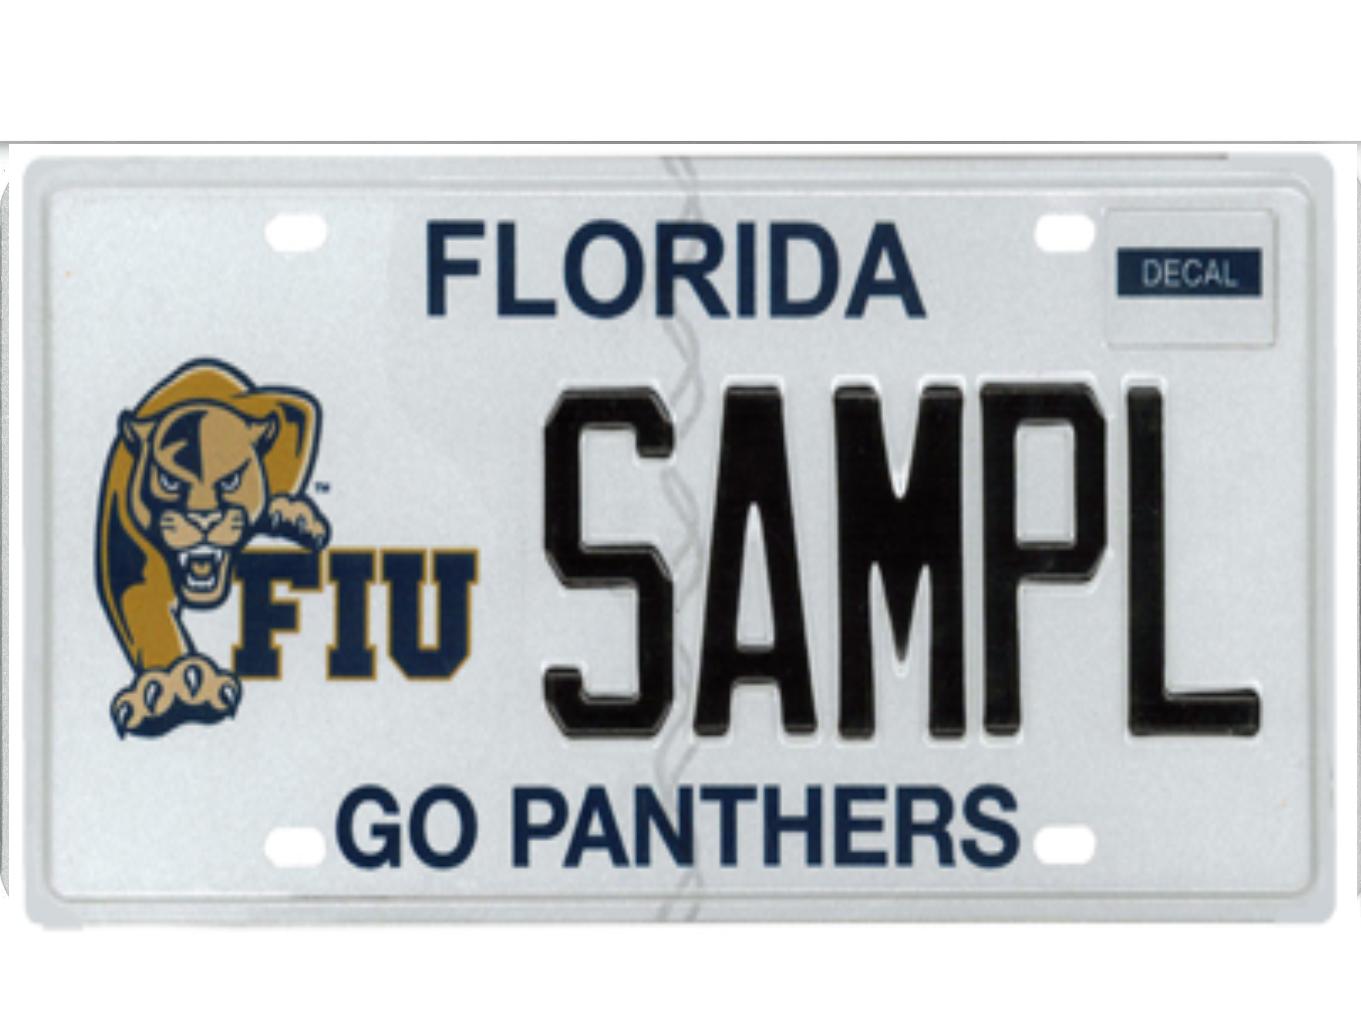 The Florida International University license plate.